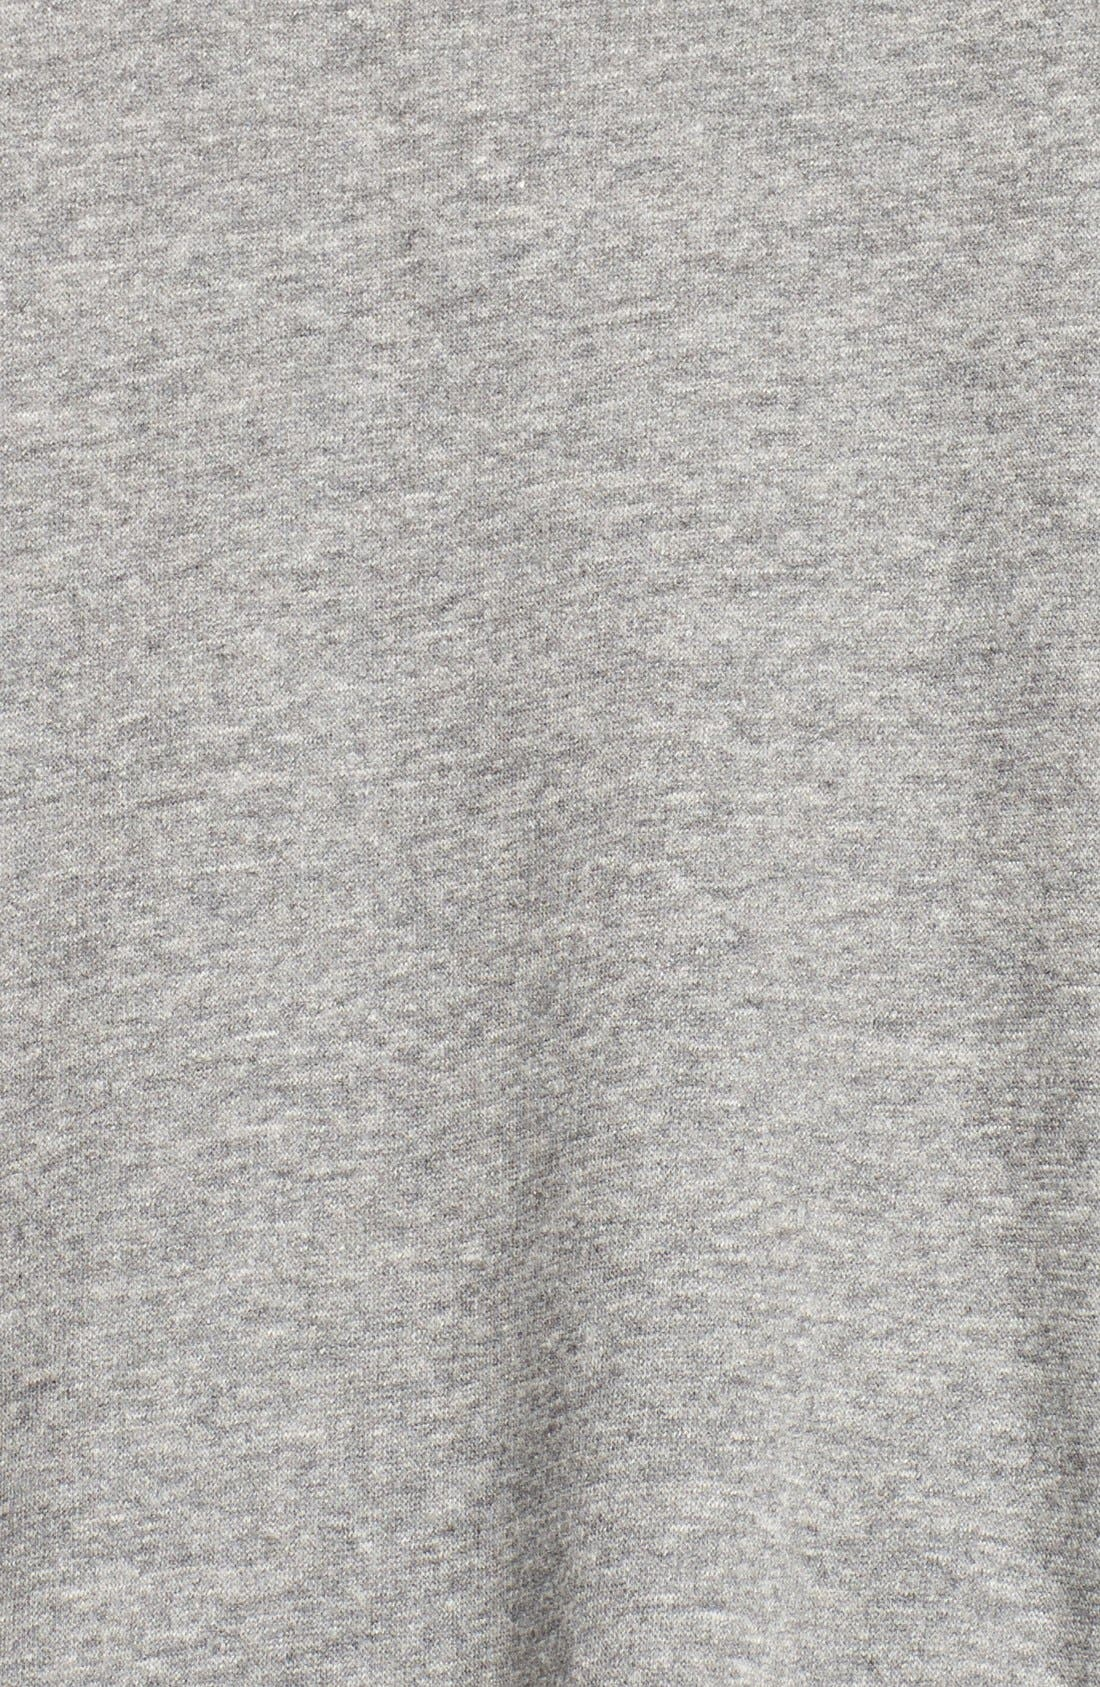 Alternate Image 3  - UGG® Australia 'Pichot' Turtleneck Poncho